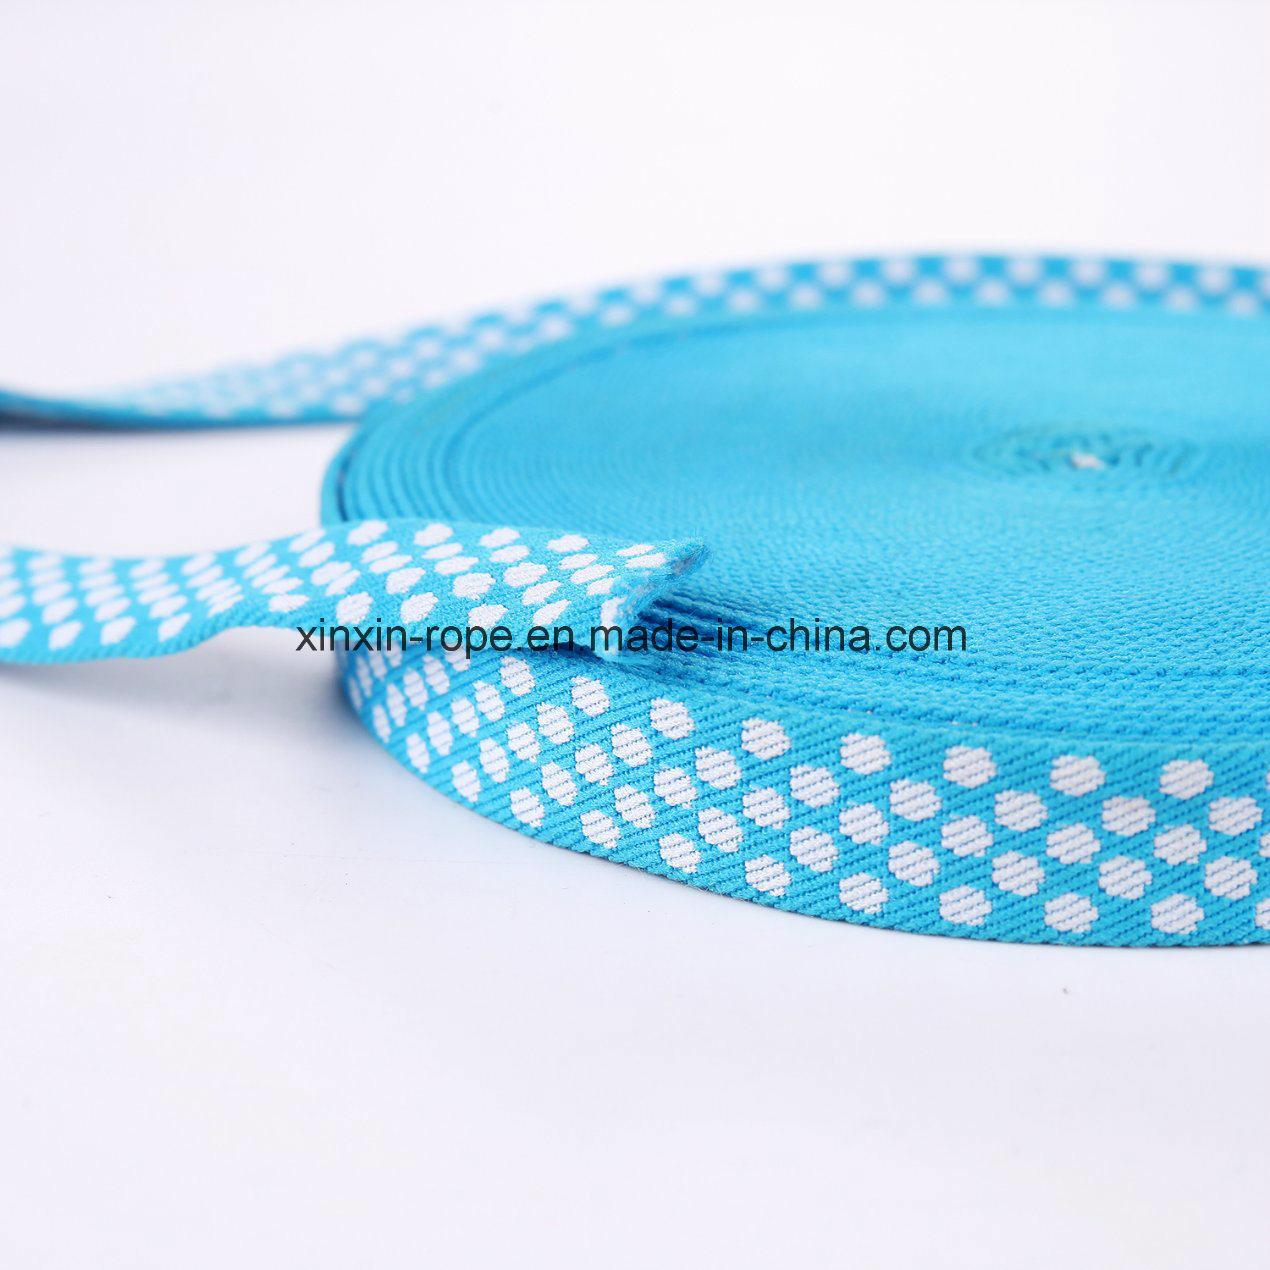 High Elastic Nylon Webbing Mashine Woven Jacquard for Garment